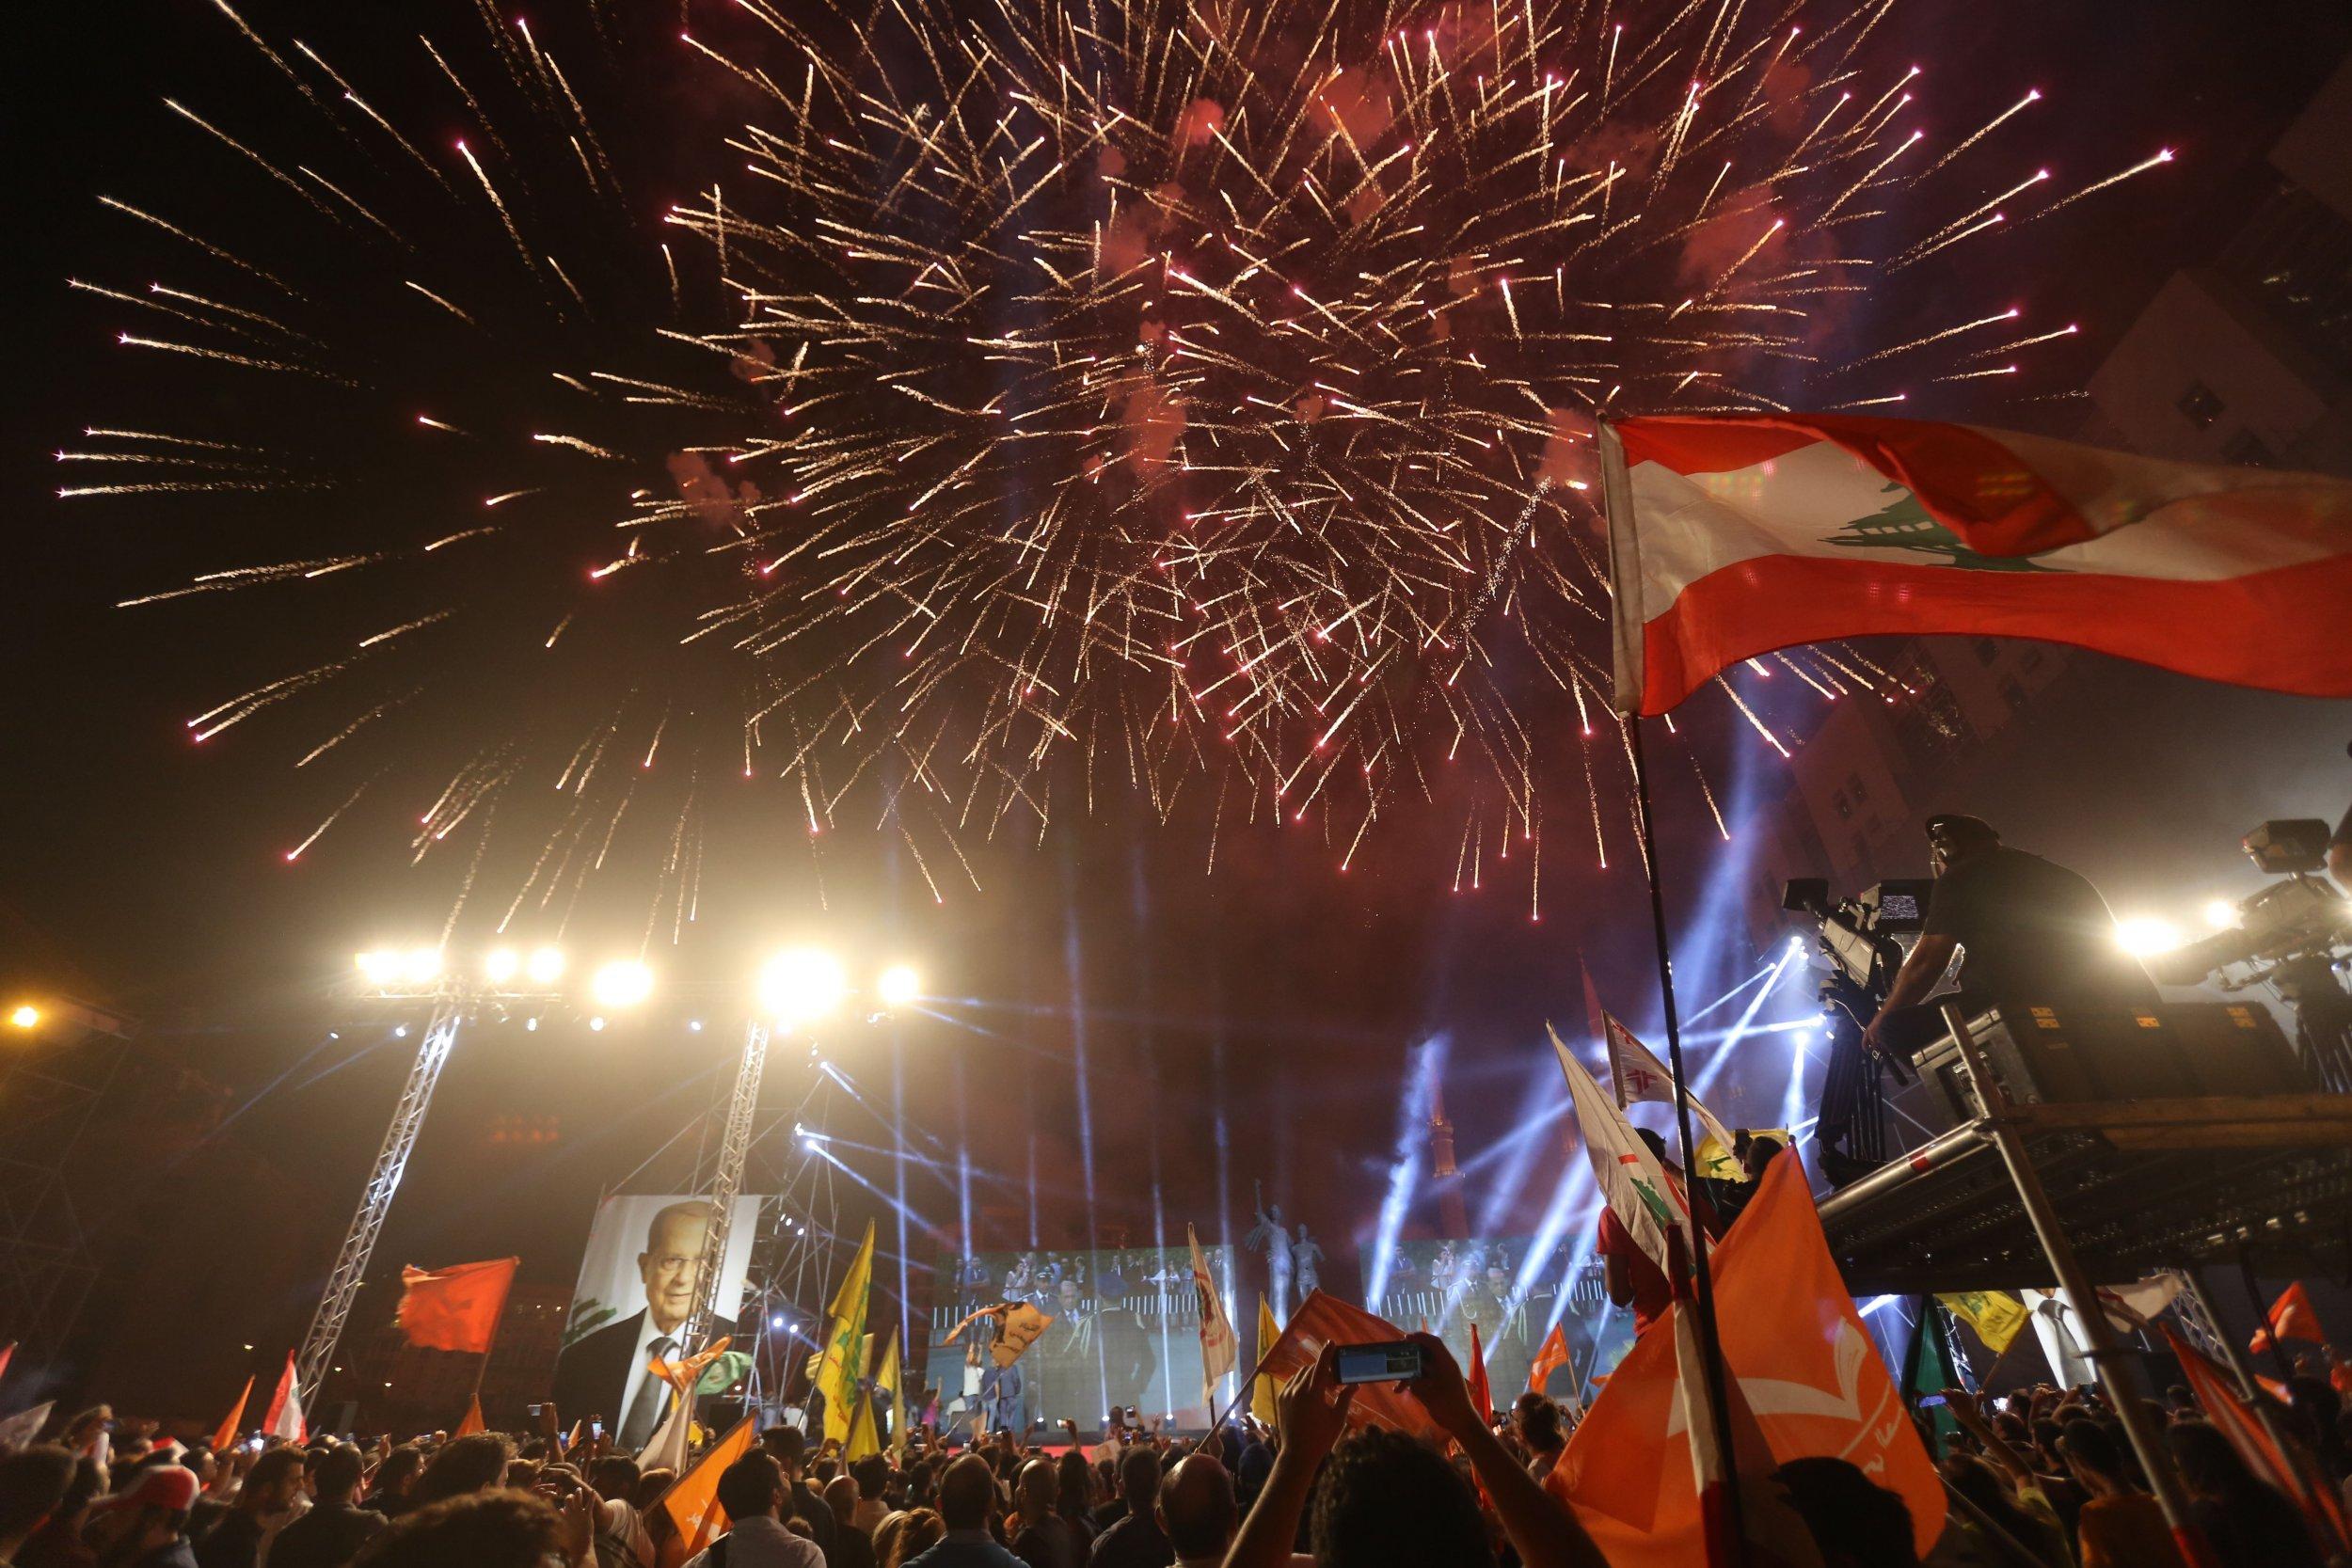 Lebanon vote